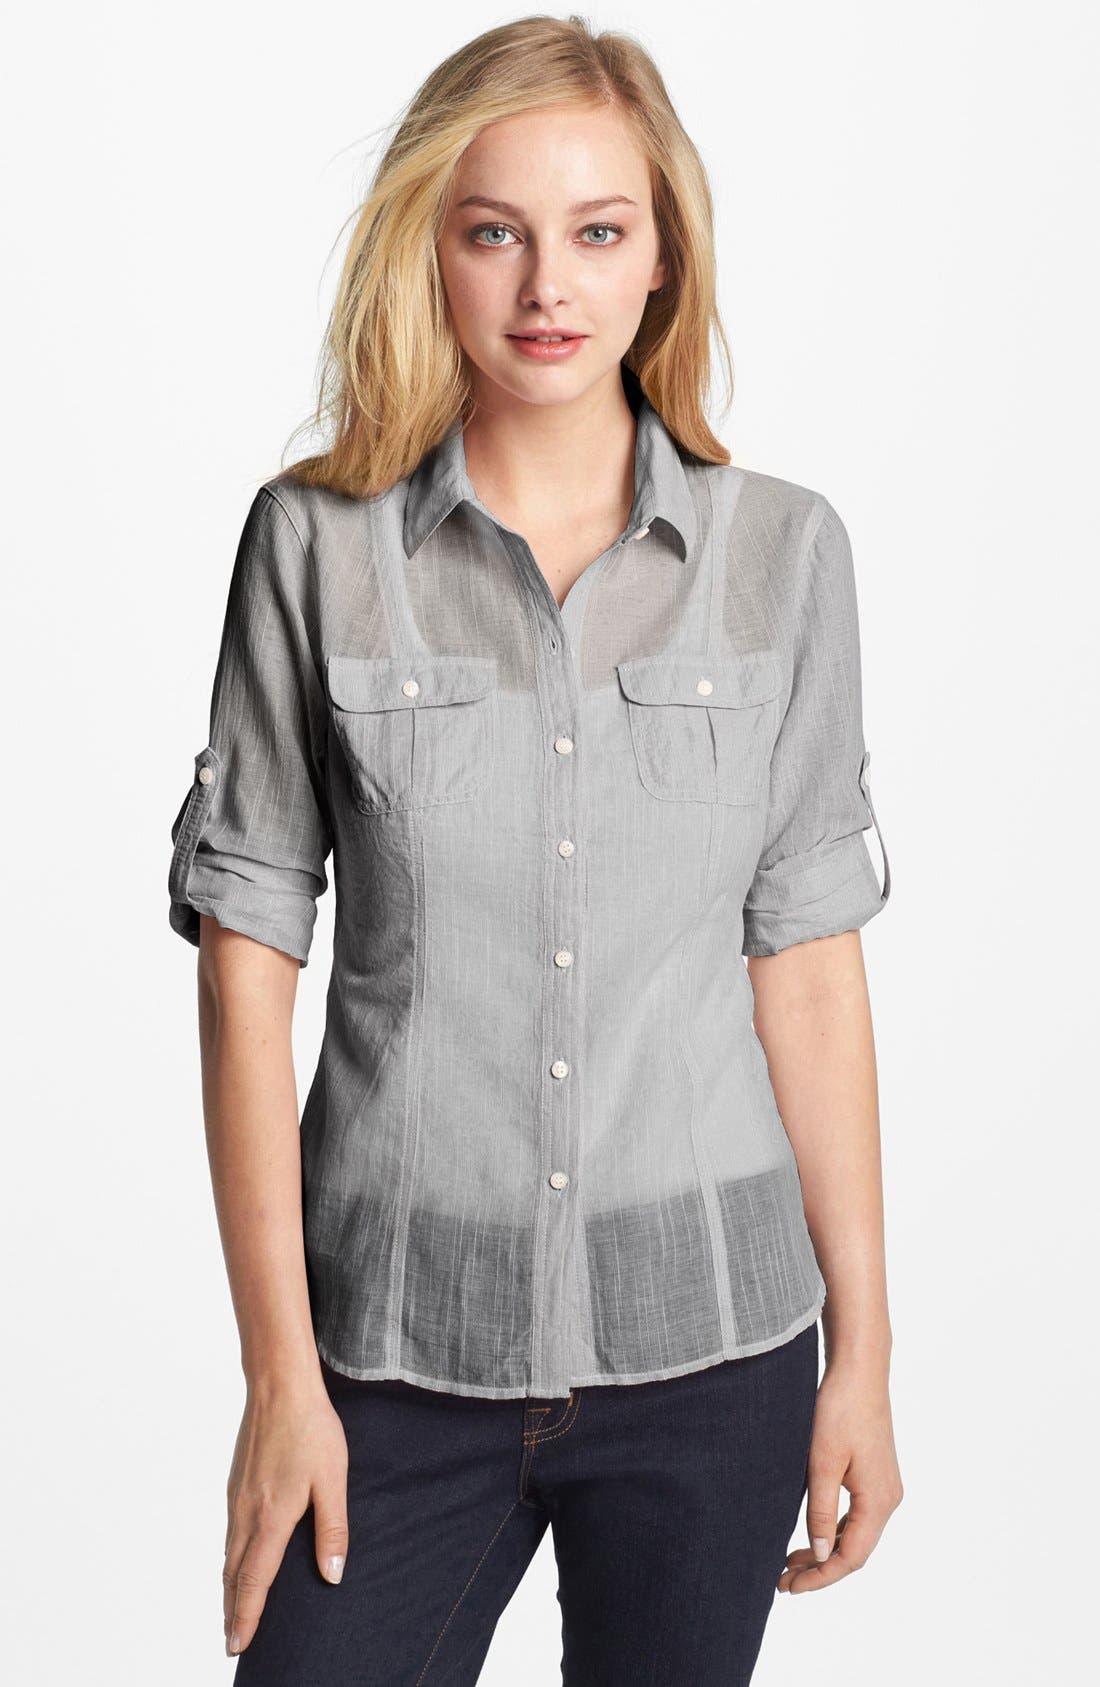 Alternate Image 1 Selected - Sandra Ingrish Roll Sleeve Shirt (Petite)